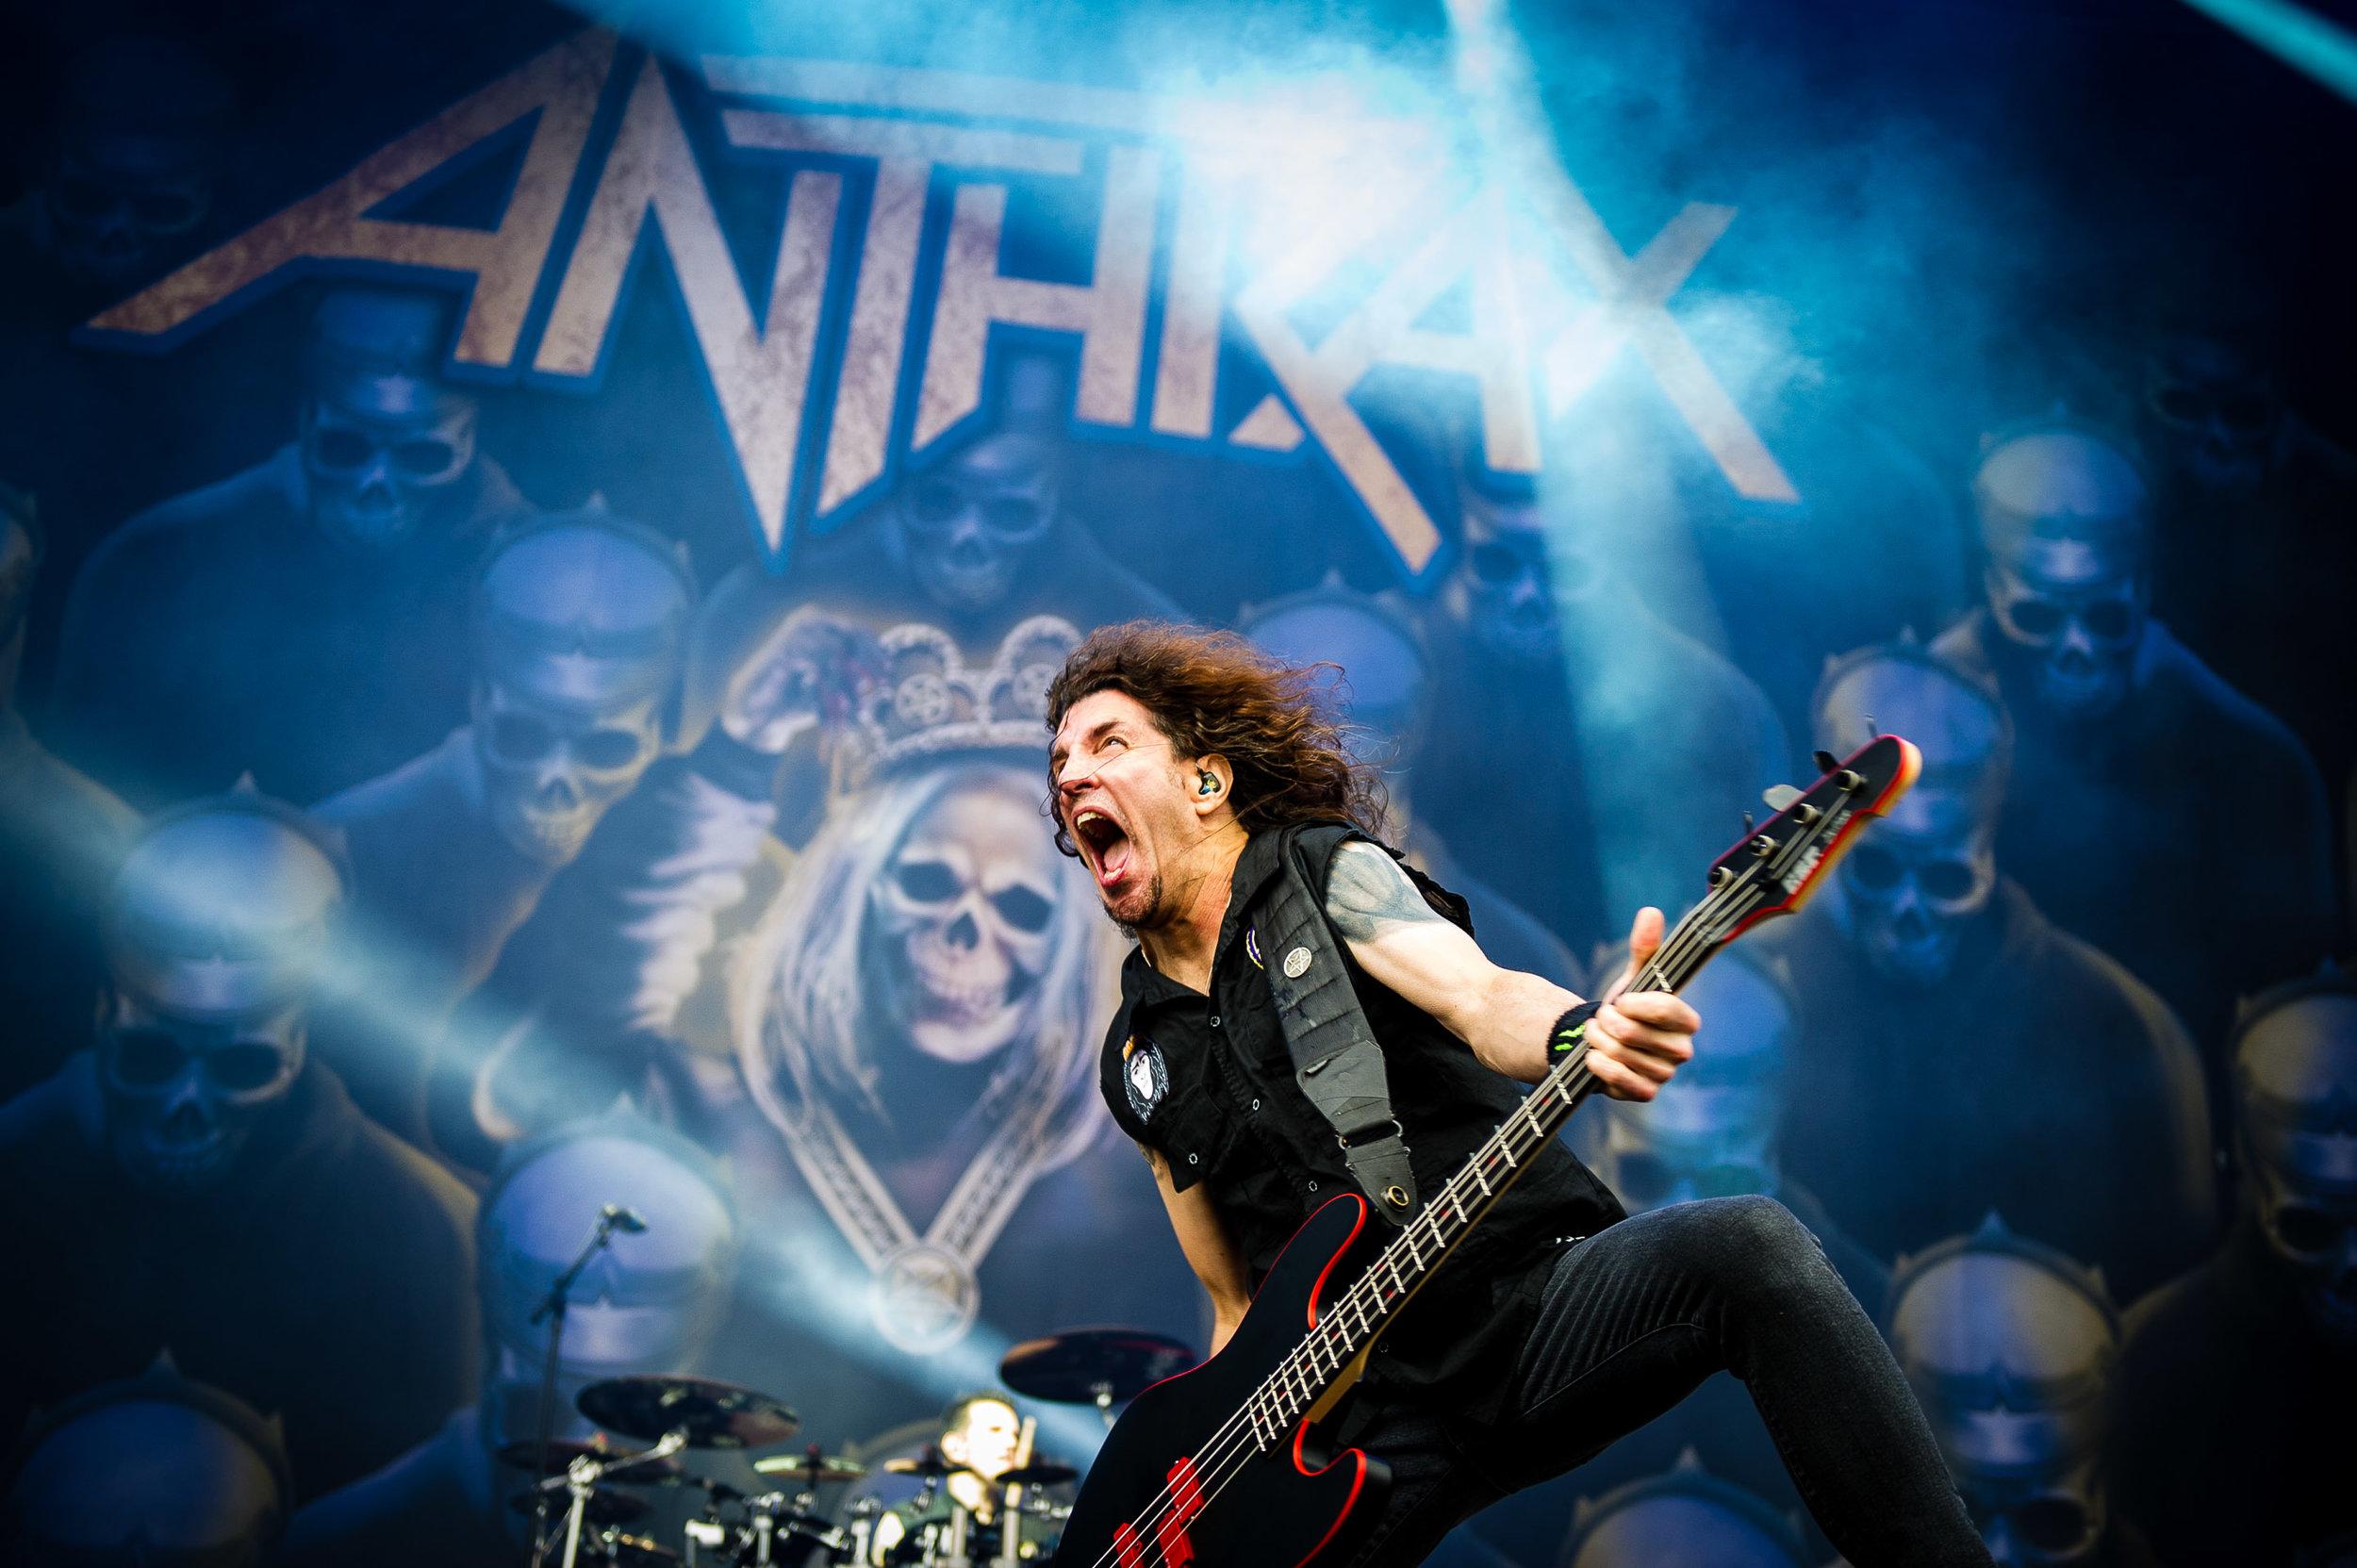 ANTHRAX photos by Matt Young